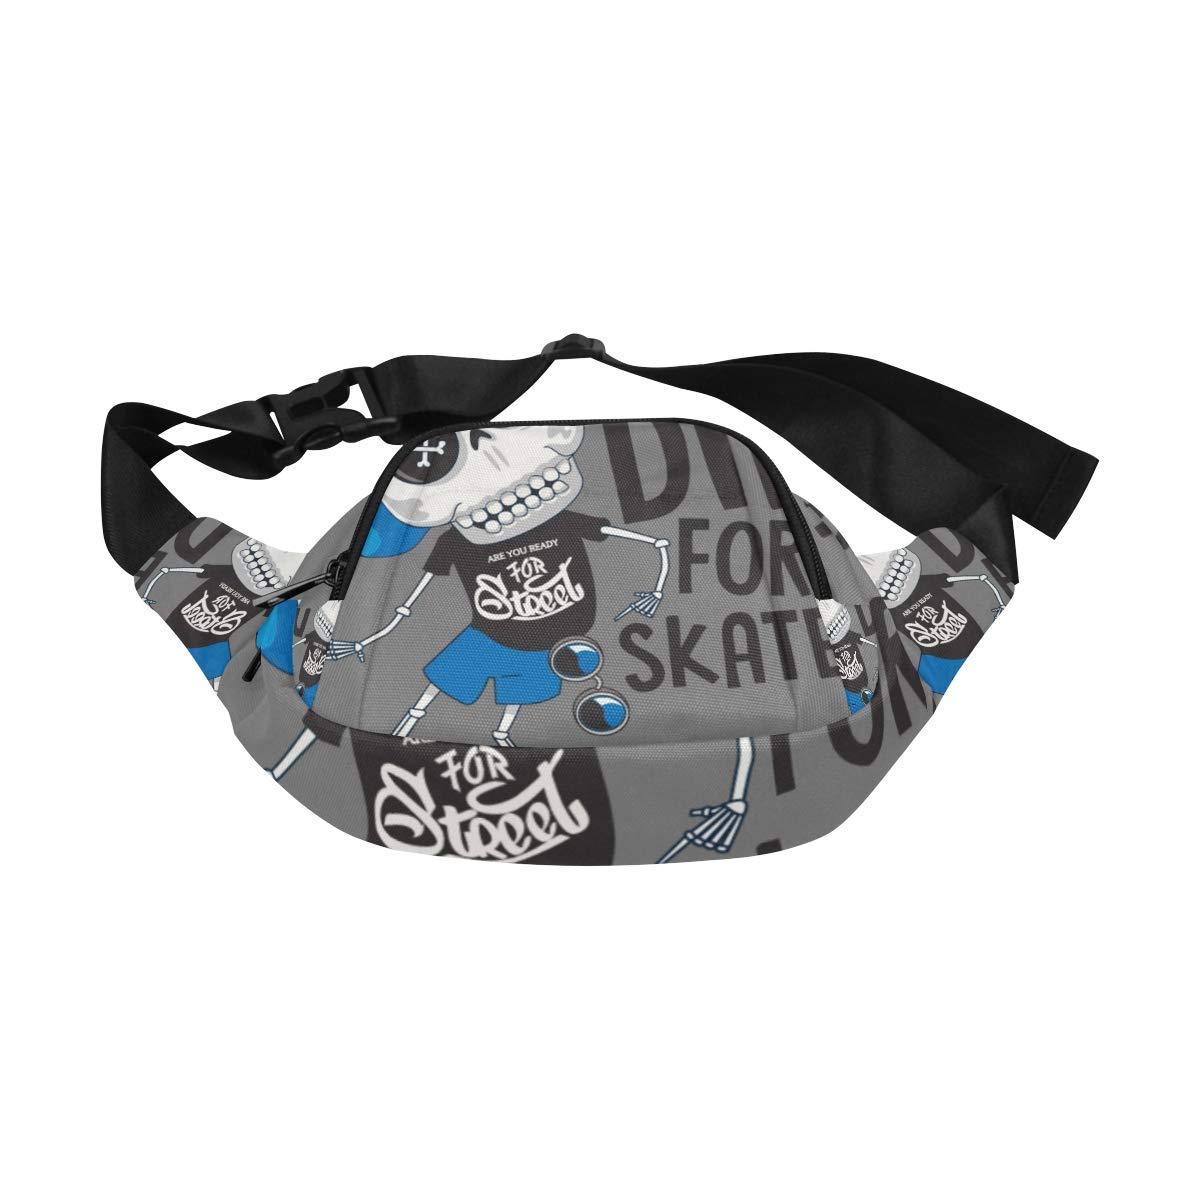 Young People Hip-hop Cool Skulls Fenny Packs Waist Bags Adjustable Belt Waterproof Nylon Travel Running Sport Vacation Party For Men Women Boys Girls Kids